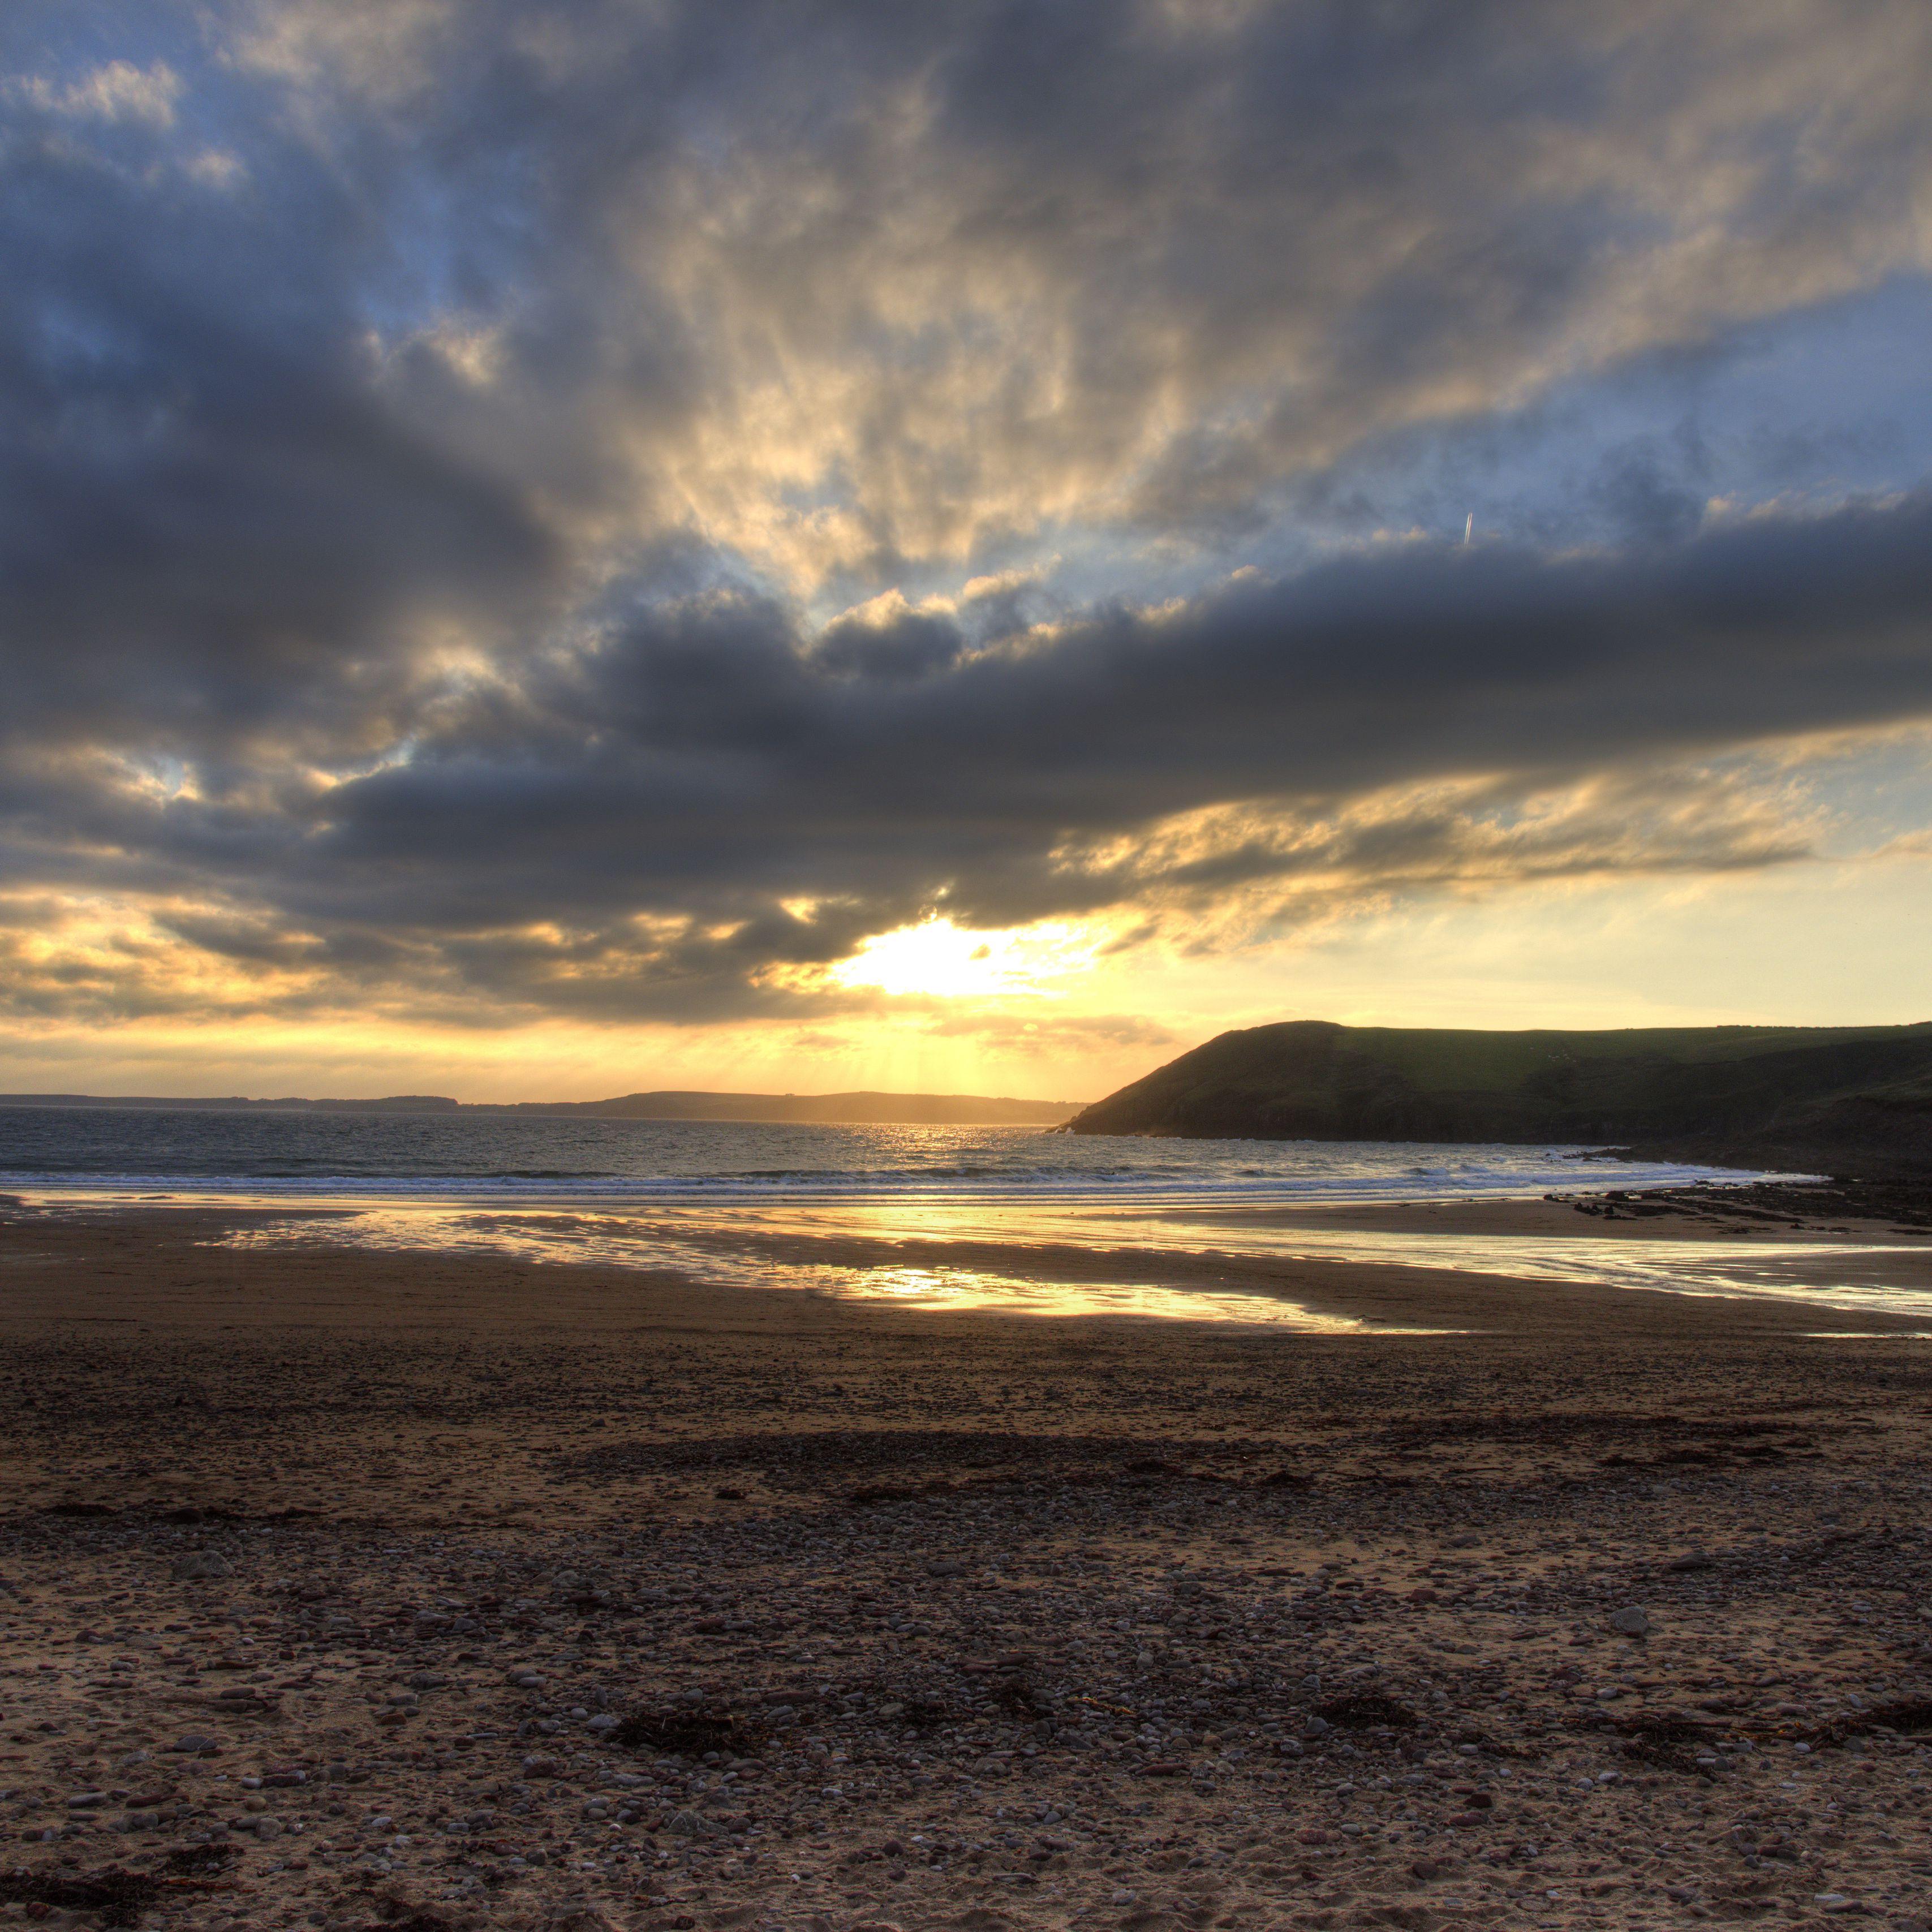 3415x3415 Wallpaper shore, water, sunset, landscape